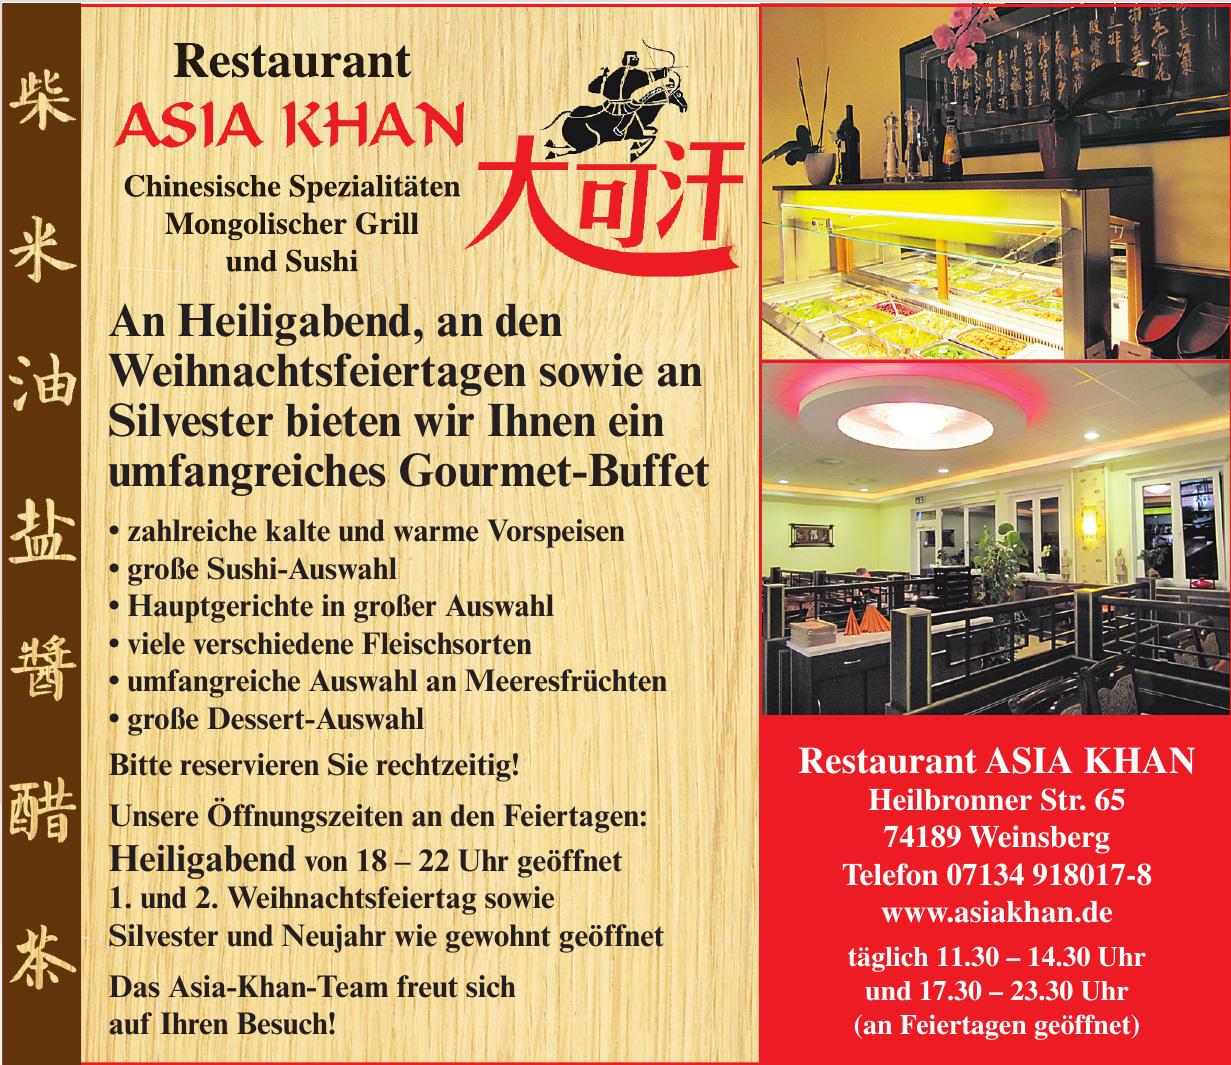 Restaurant Asia Khan